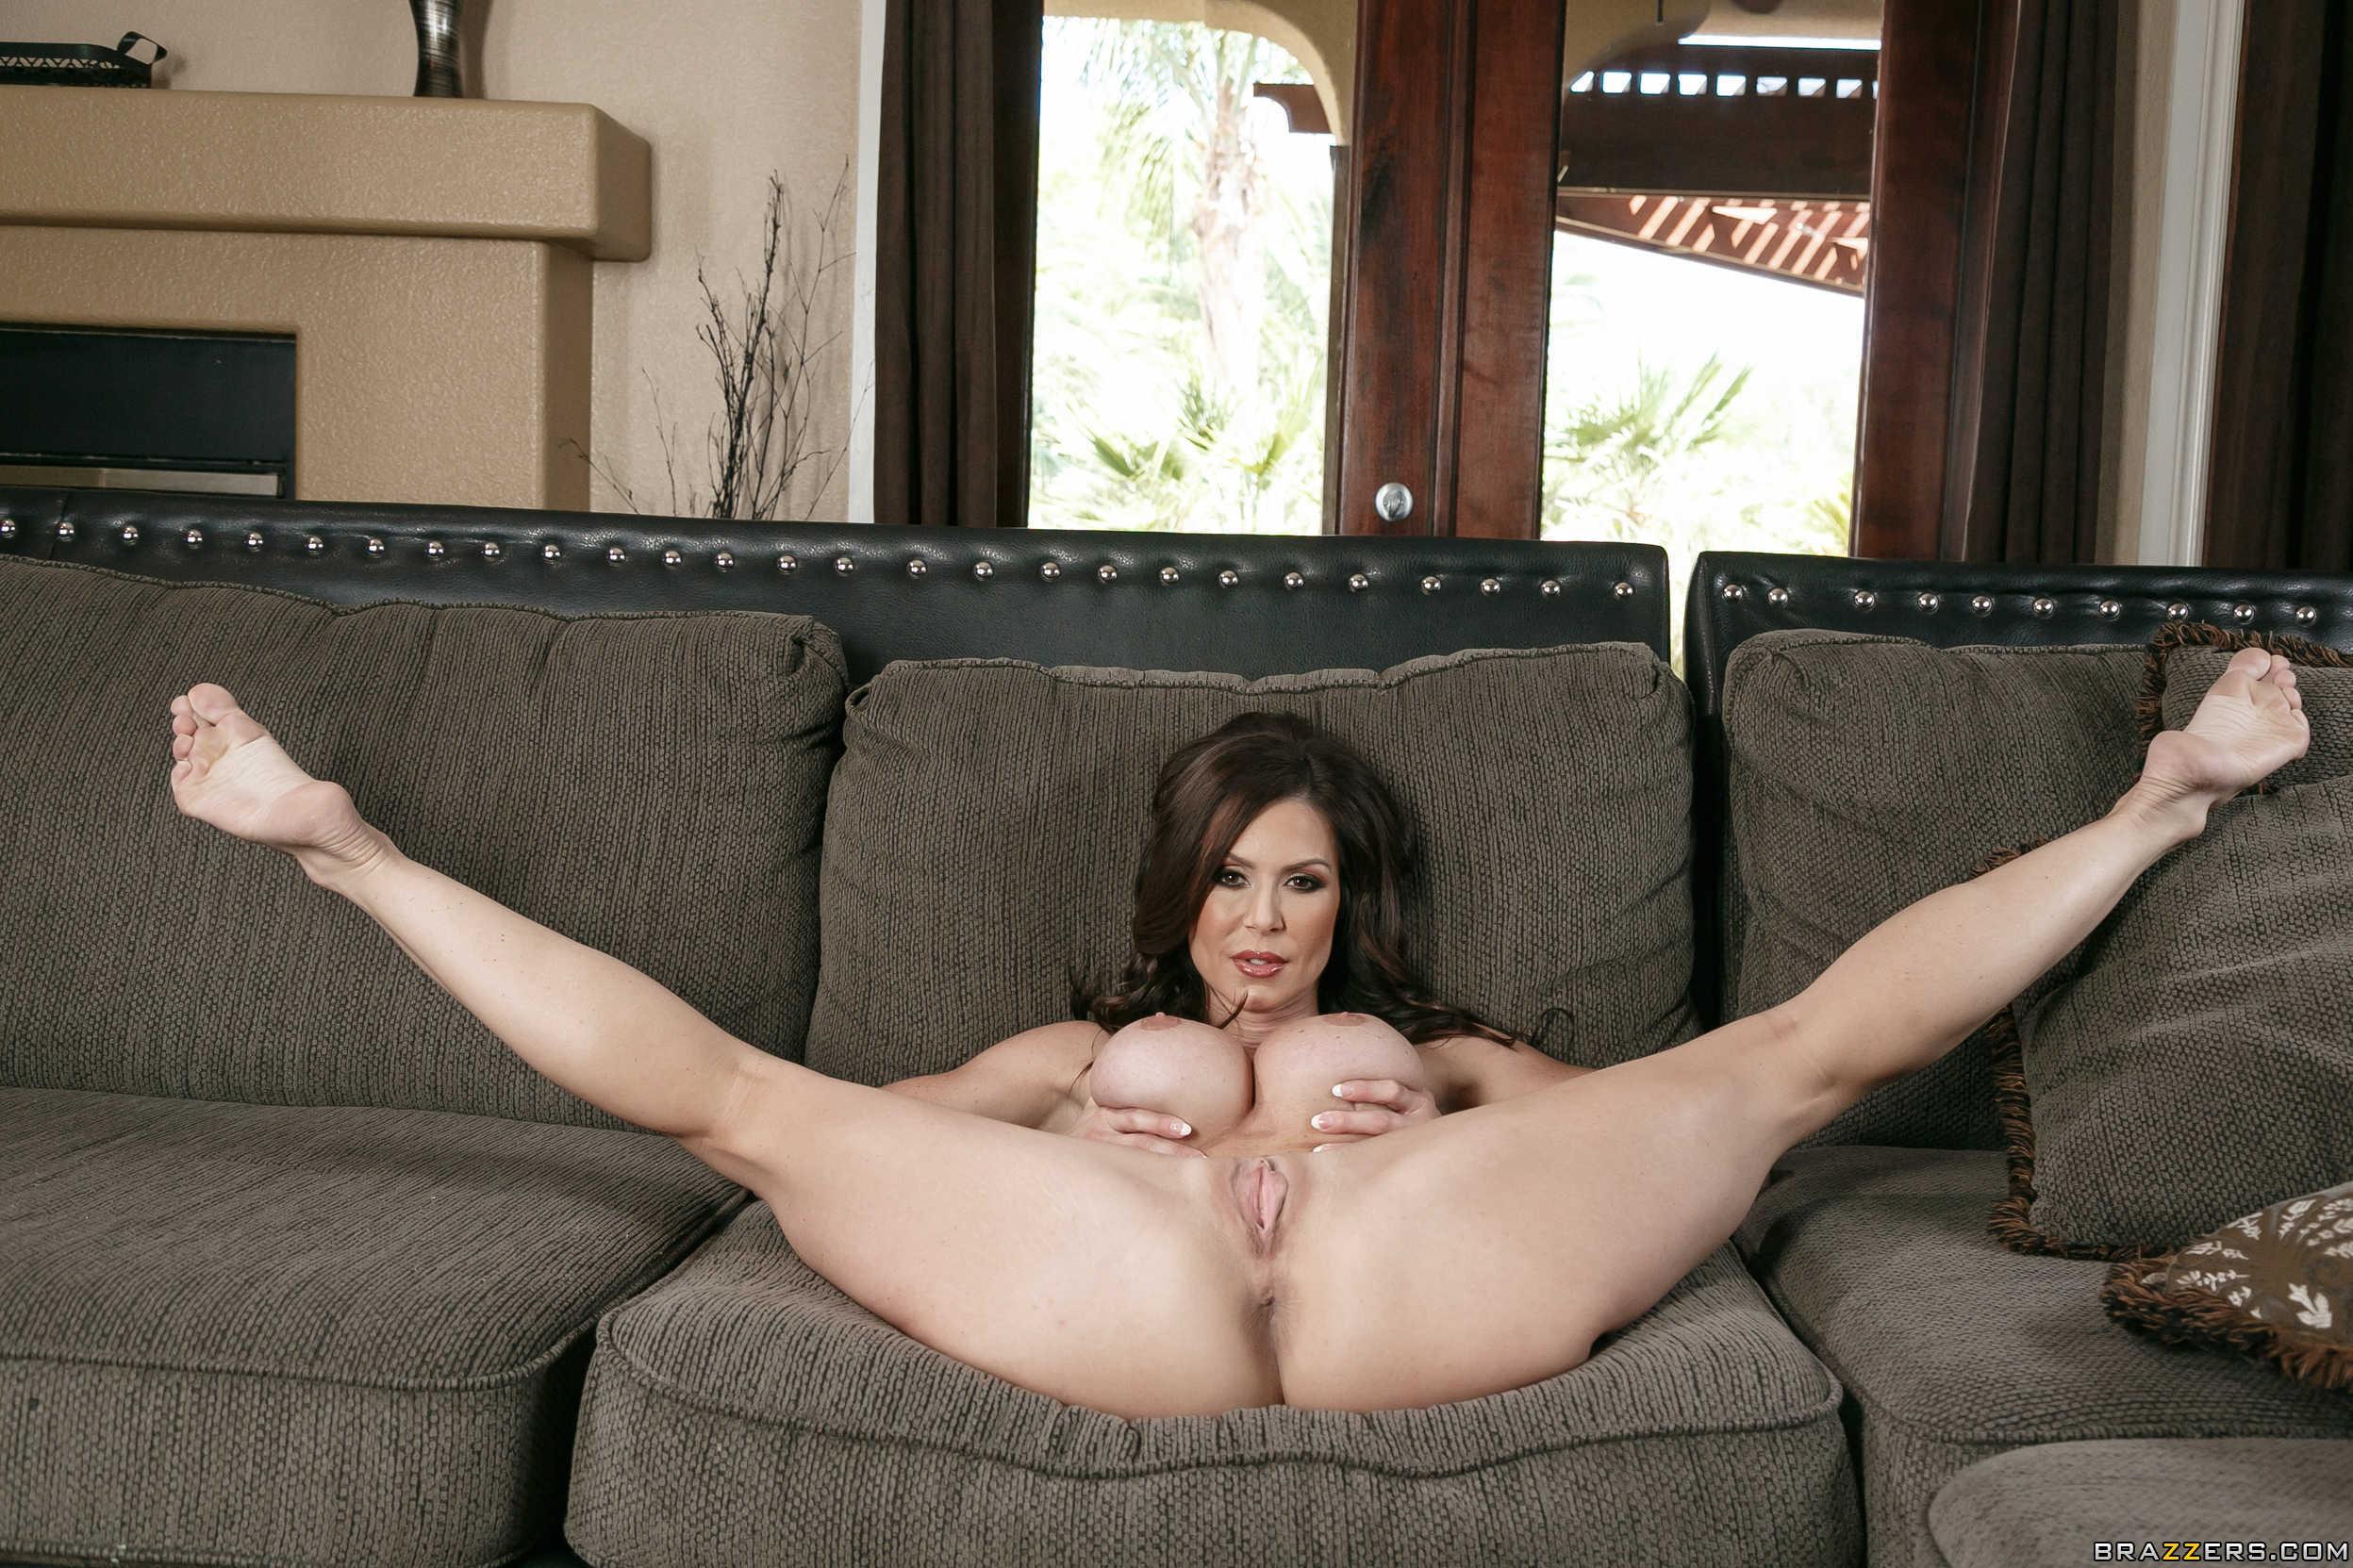 Free Sexy Nude Women Pics Spread Wide